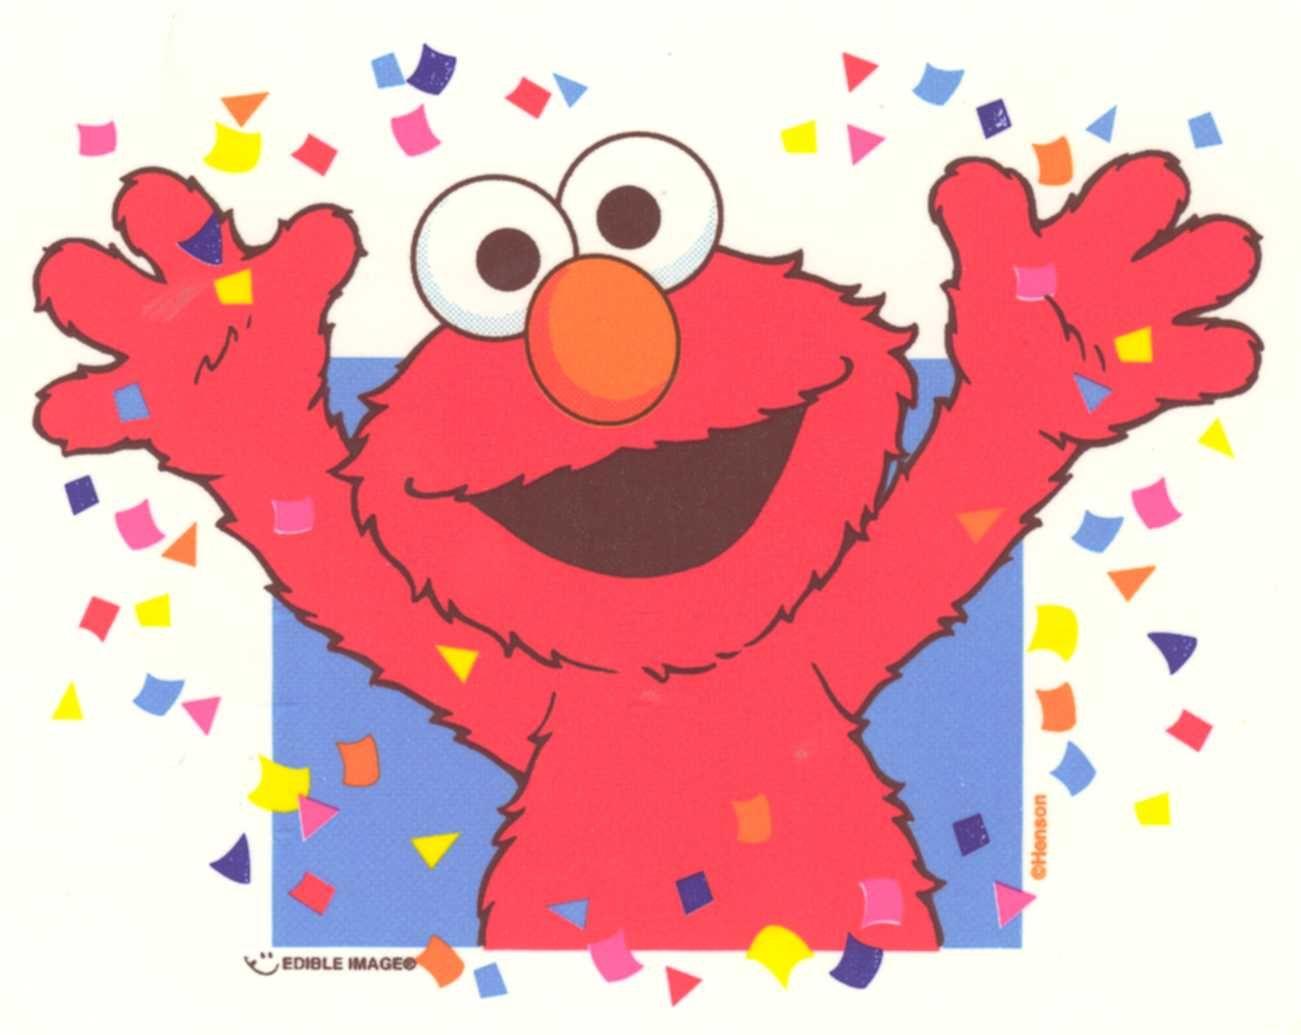 Feliz Cumple Gaby!!! | party | Pinterest | Feliz cumple, Gaby y Cumple